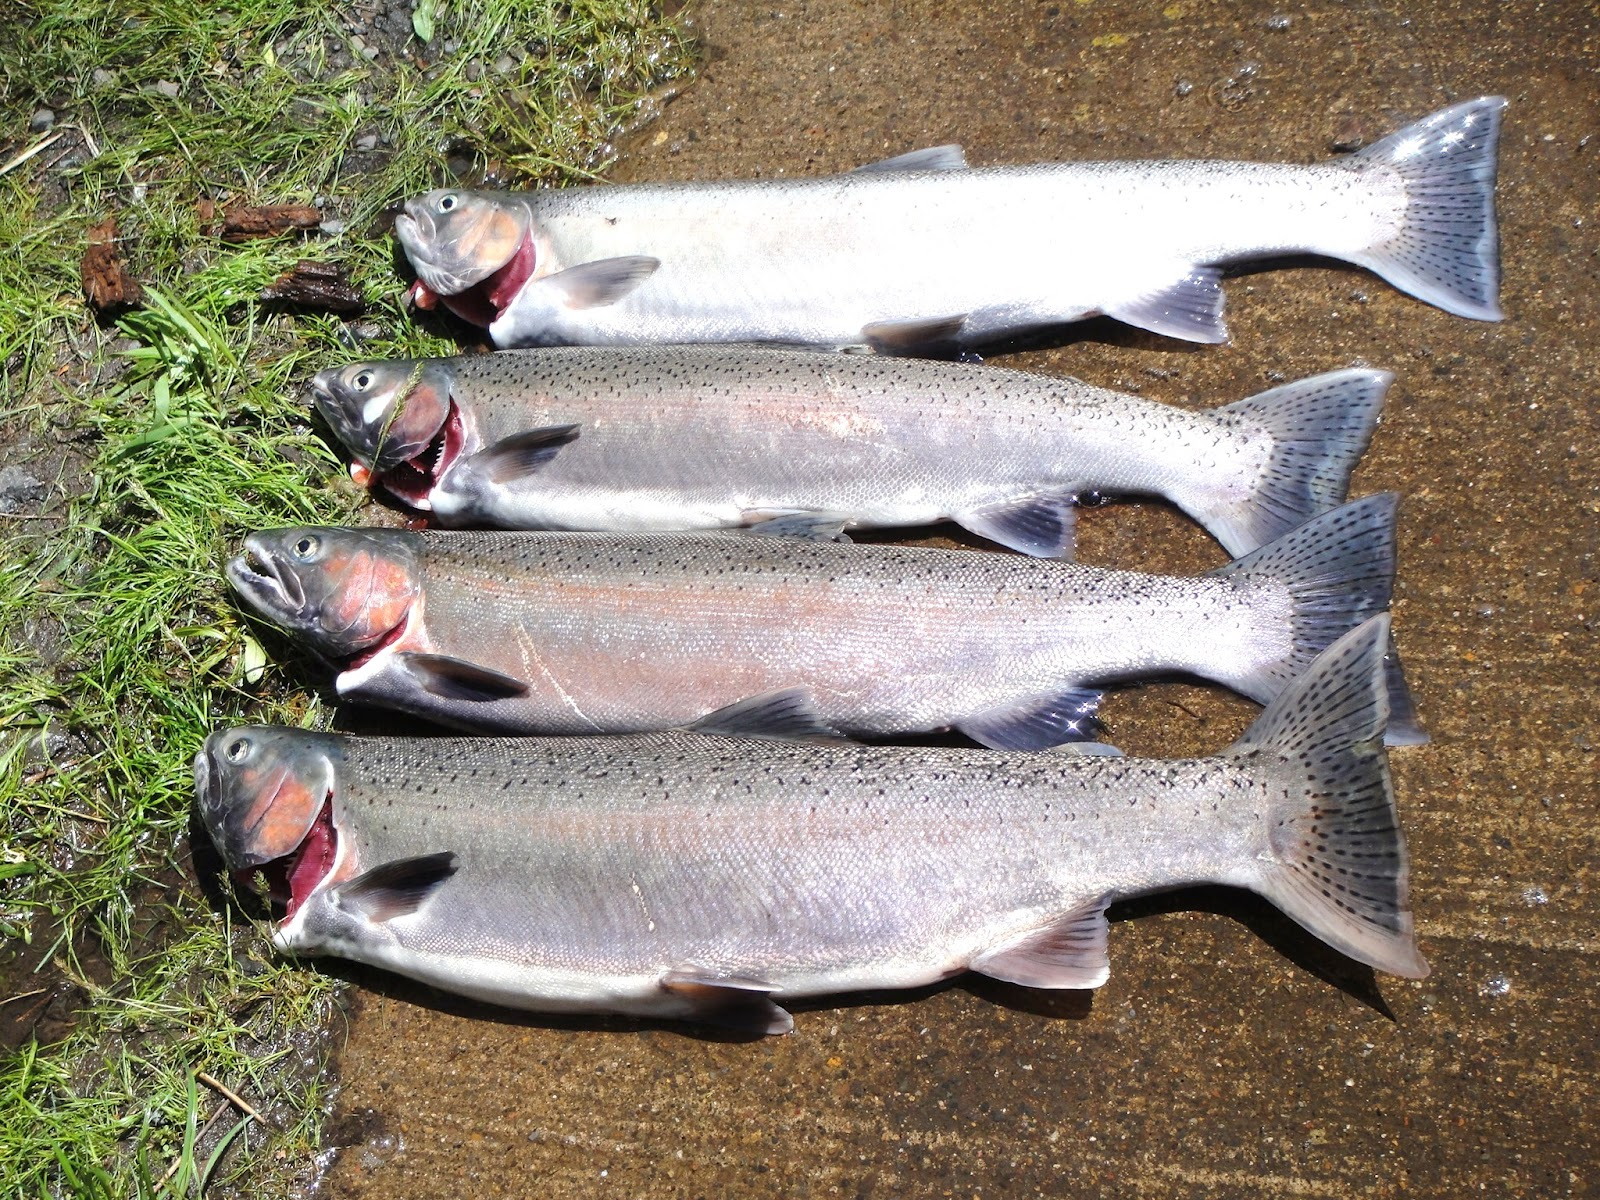 Rogue river fishing guides fishing the rogue fishing for Rogue river fishing report